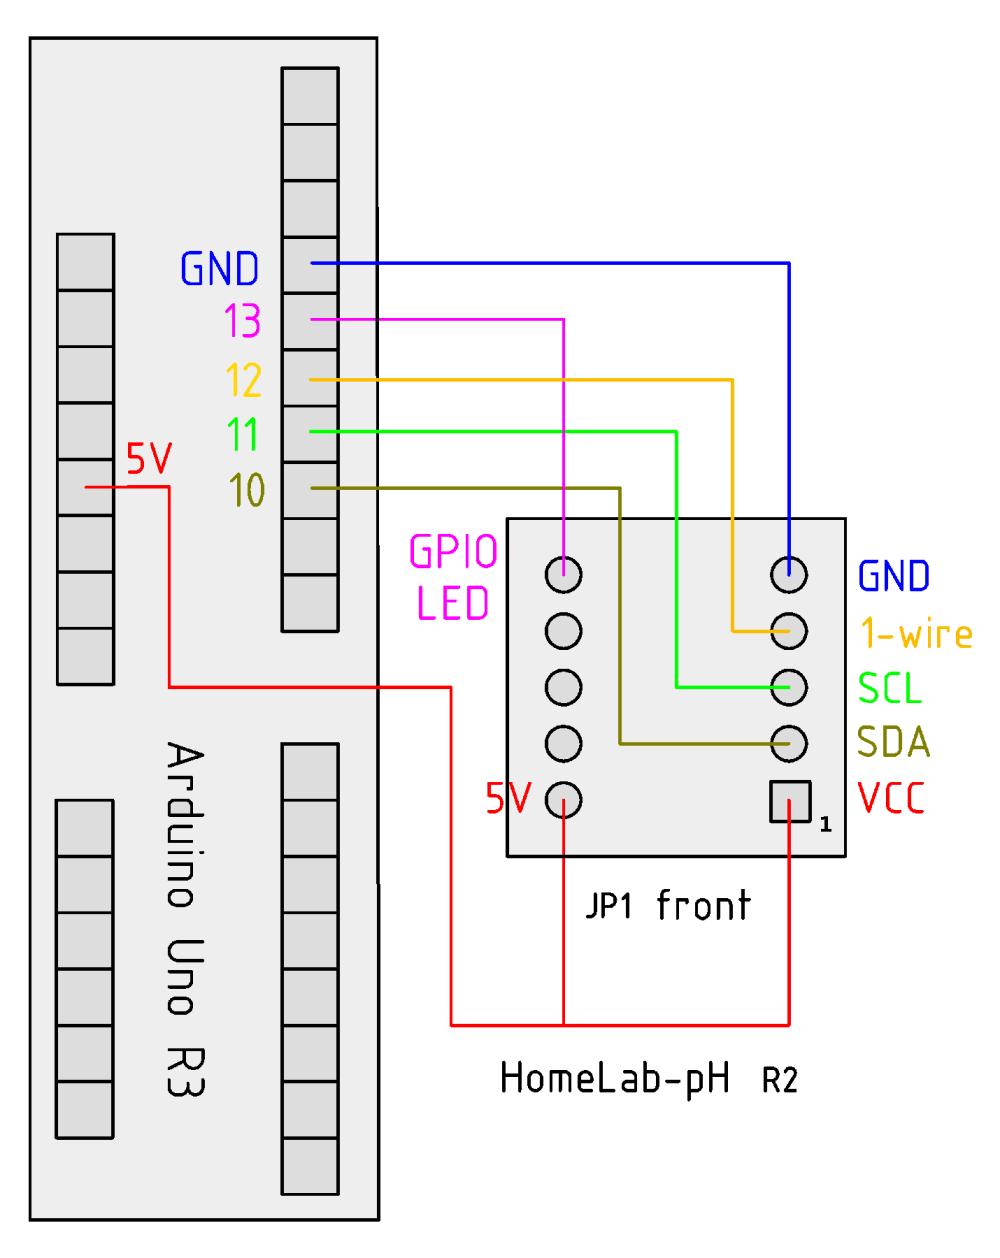 medium resolution of homelab ph connect to arduino uno r3 diagram